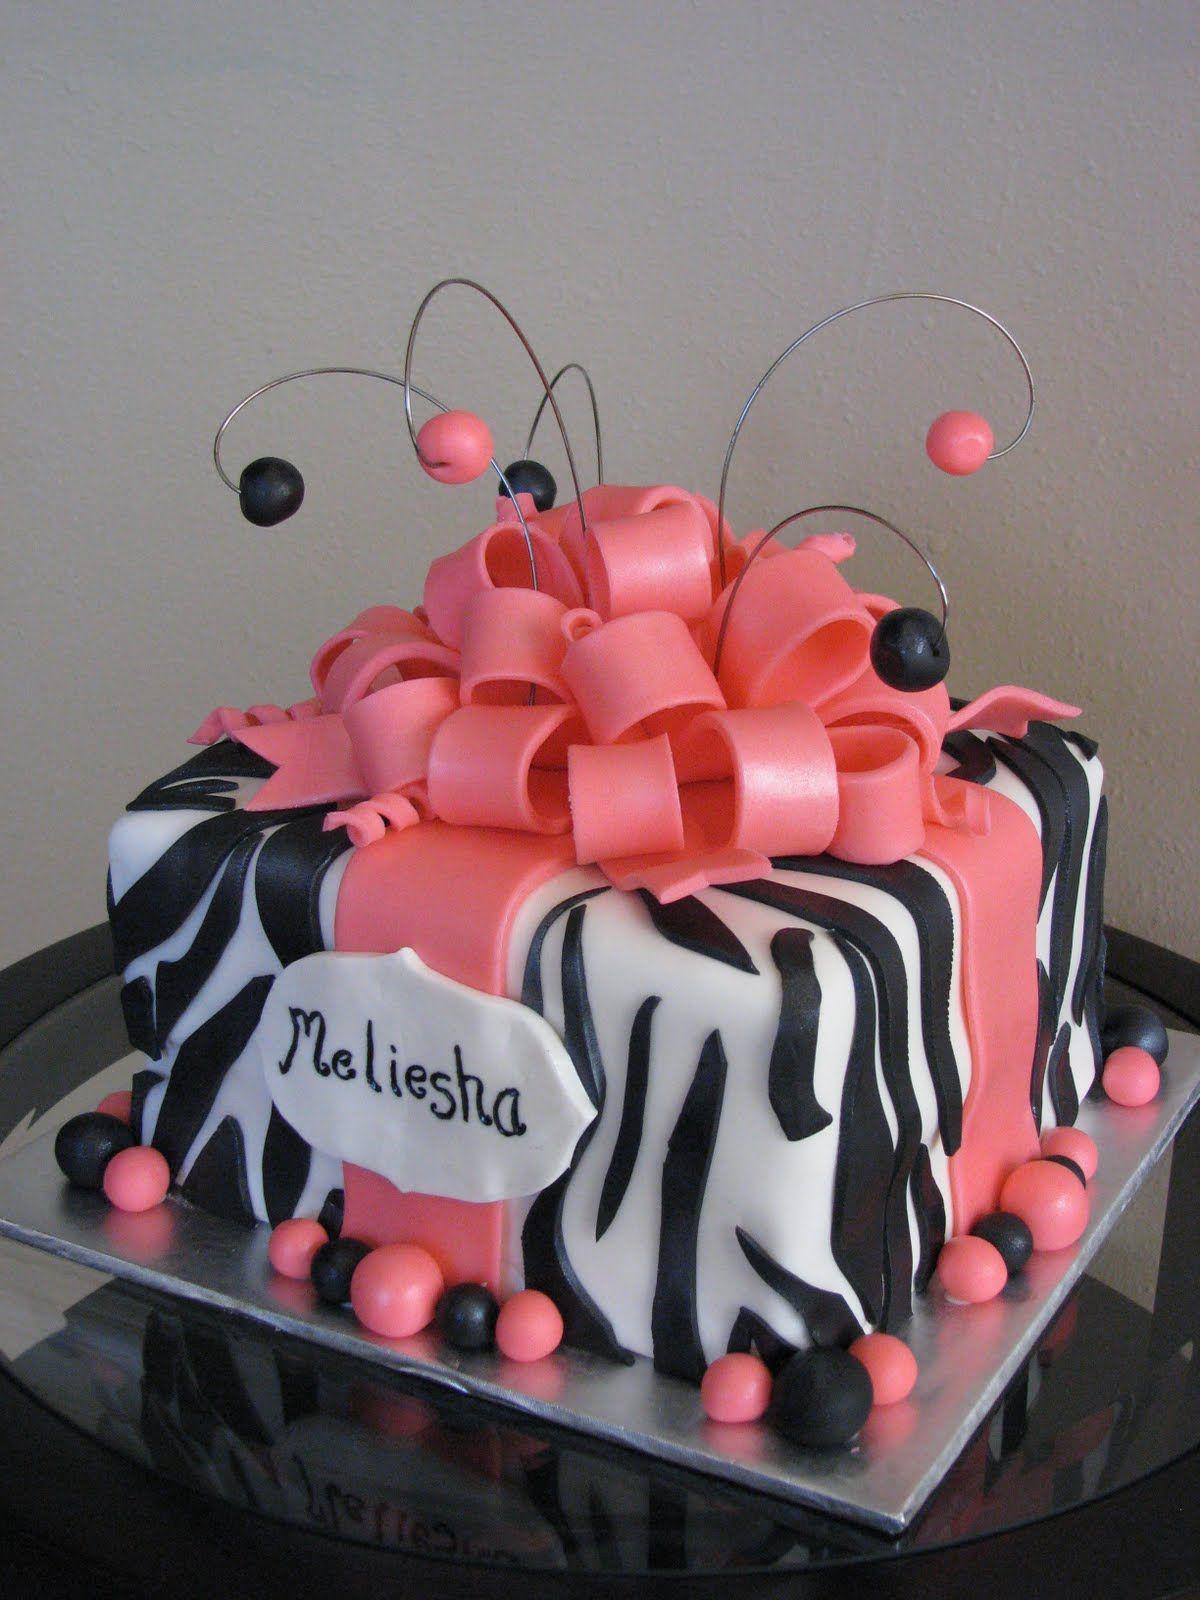 ZEBRA BIRTHDAY CAKES Bake me a Cake Zebra Birthday Cake cakes